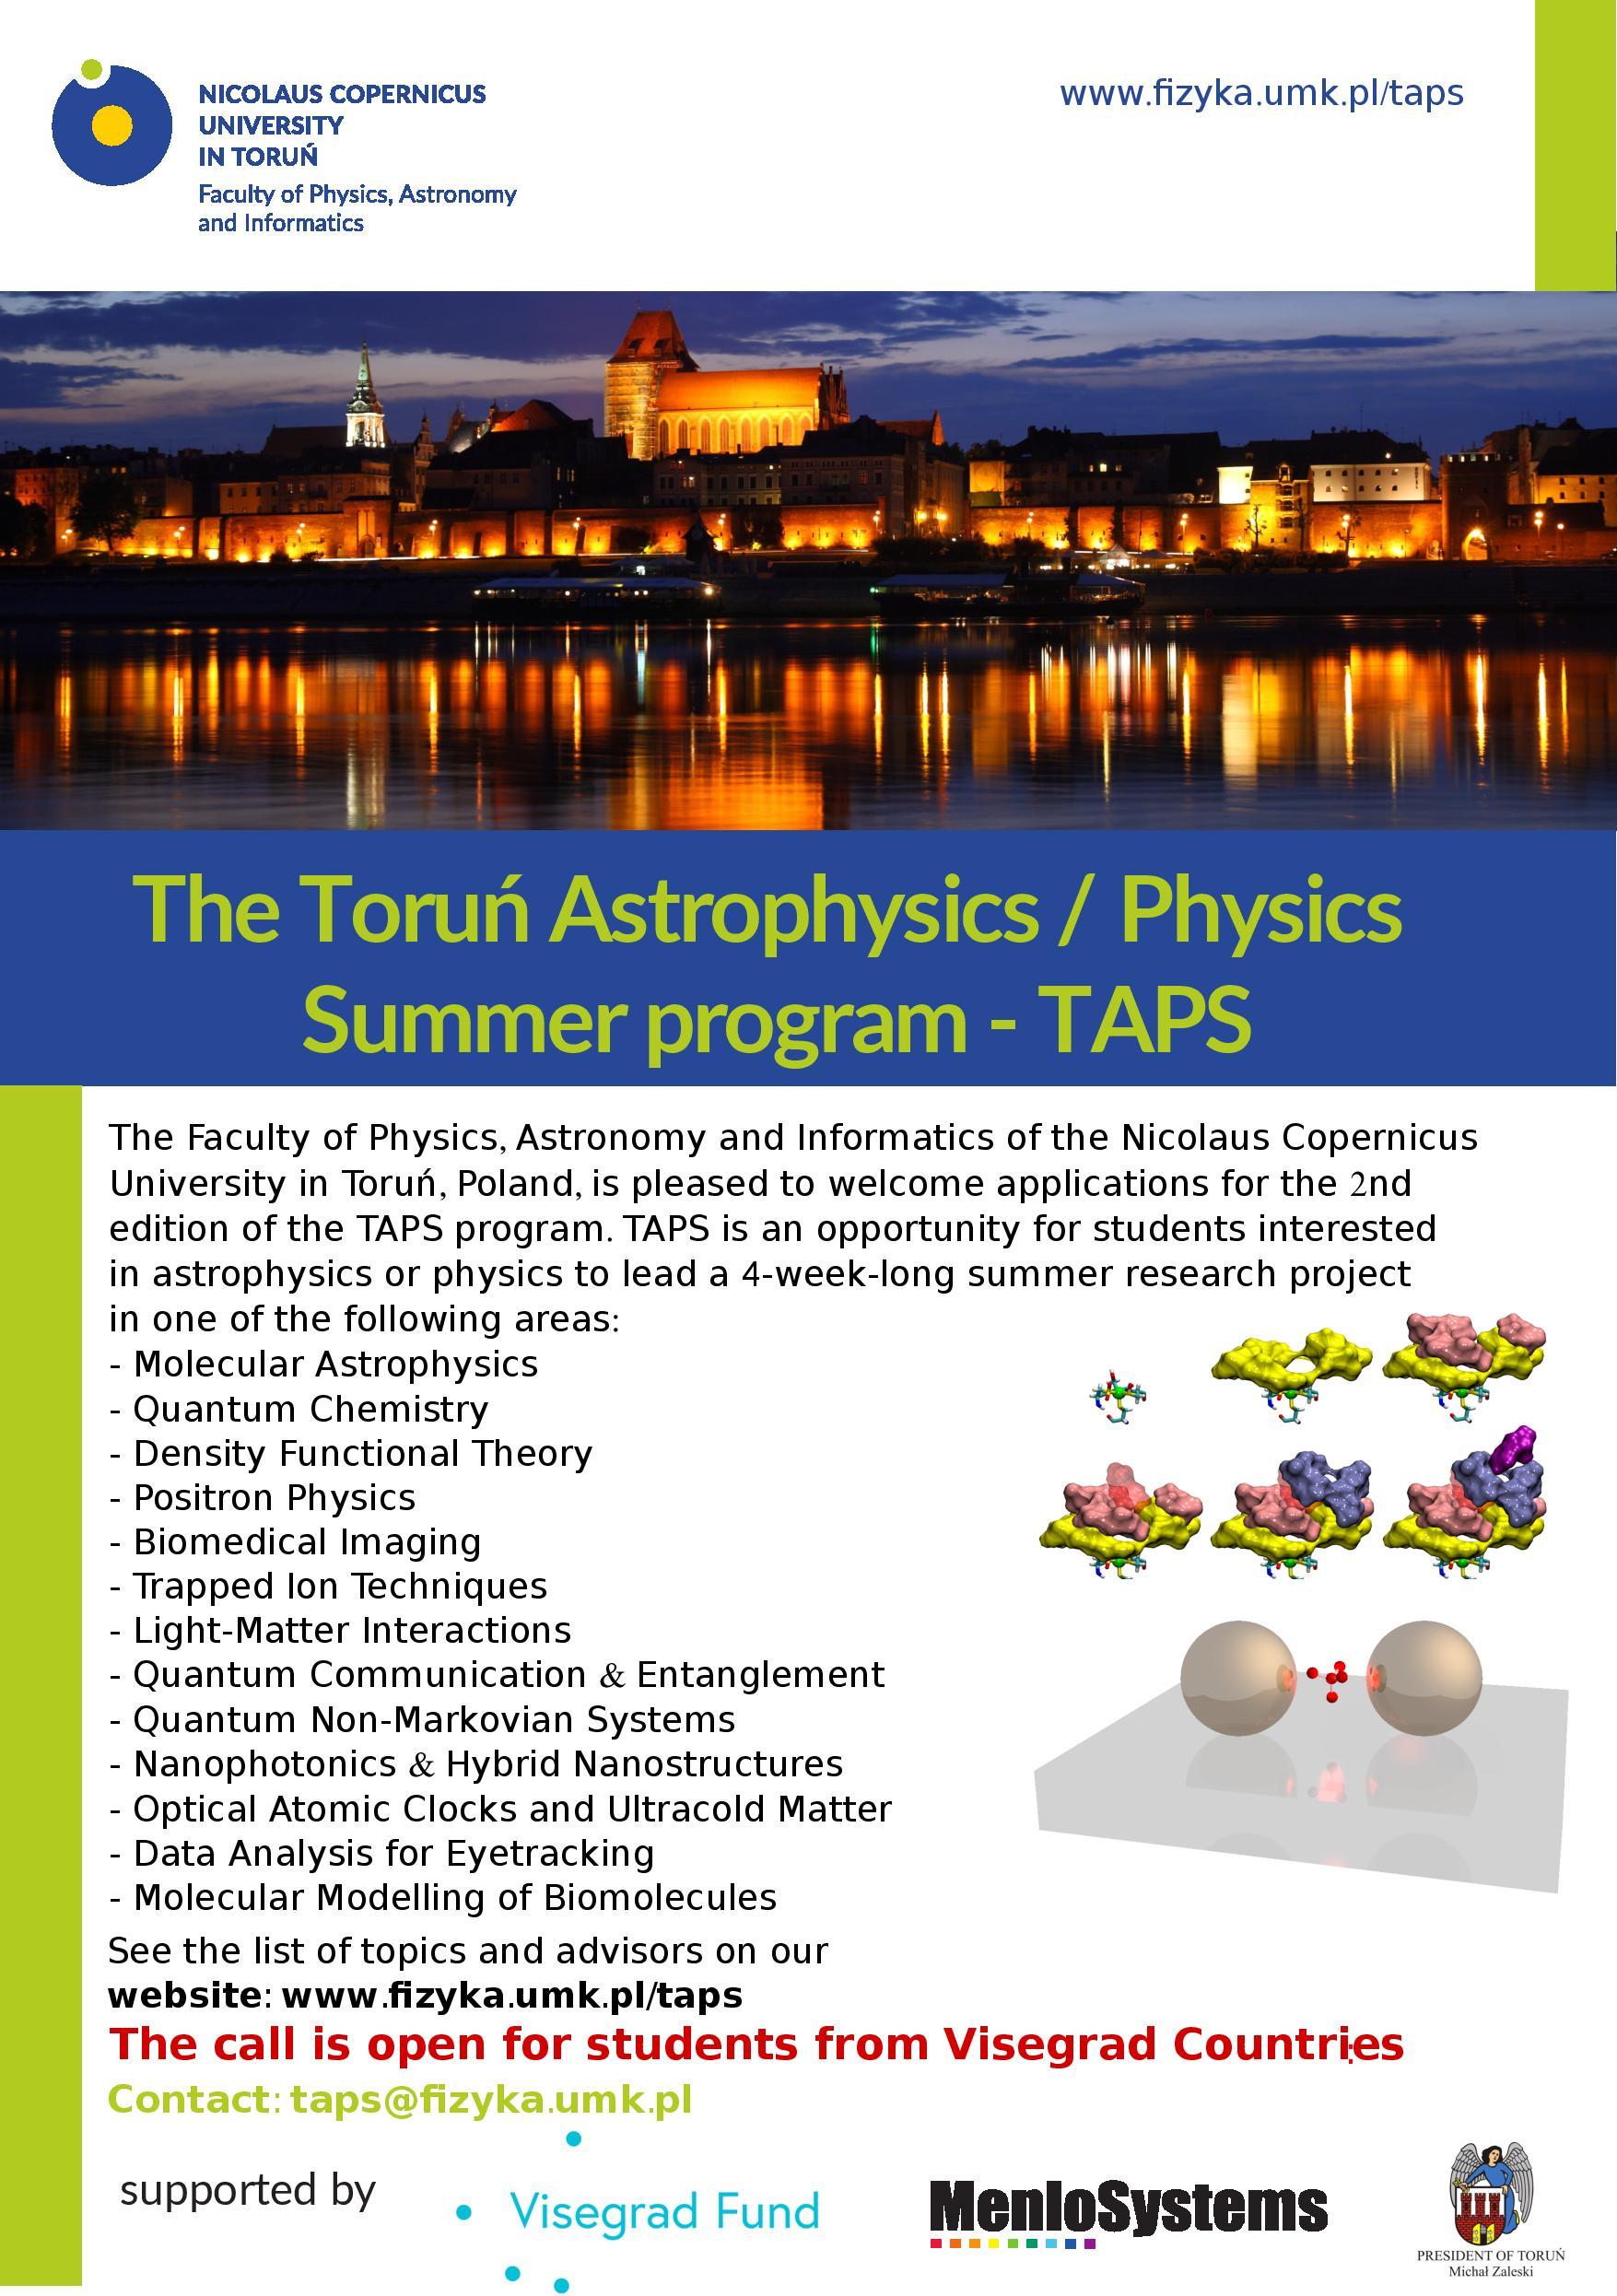 The Toruń Astrophysics / Physics Summer Program - TAPS 2018